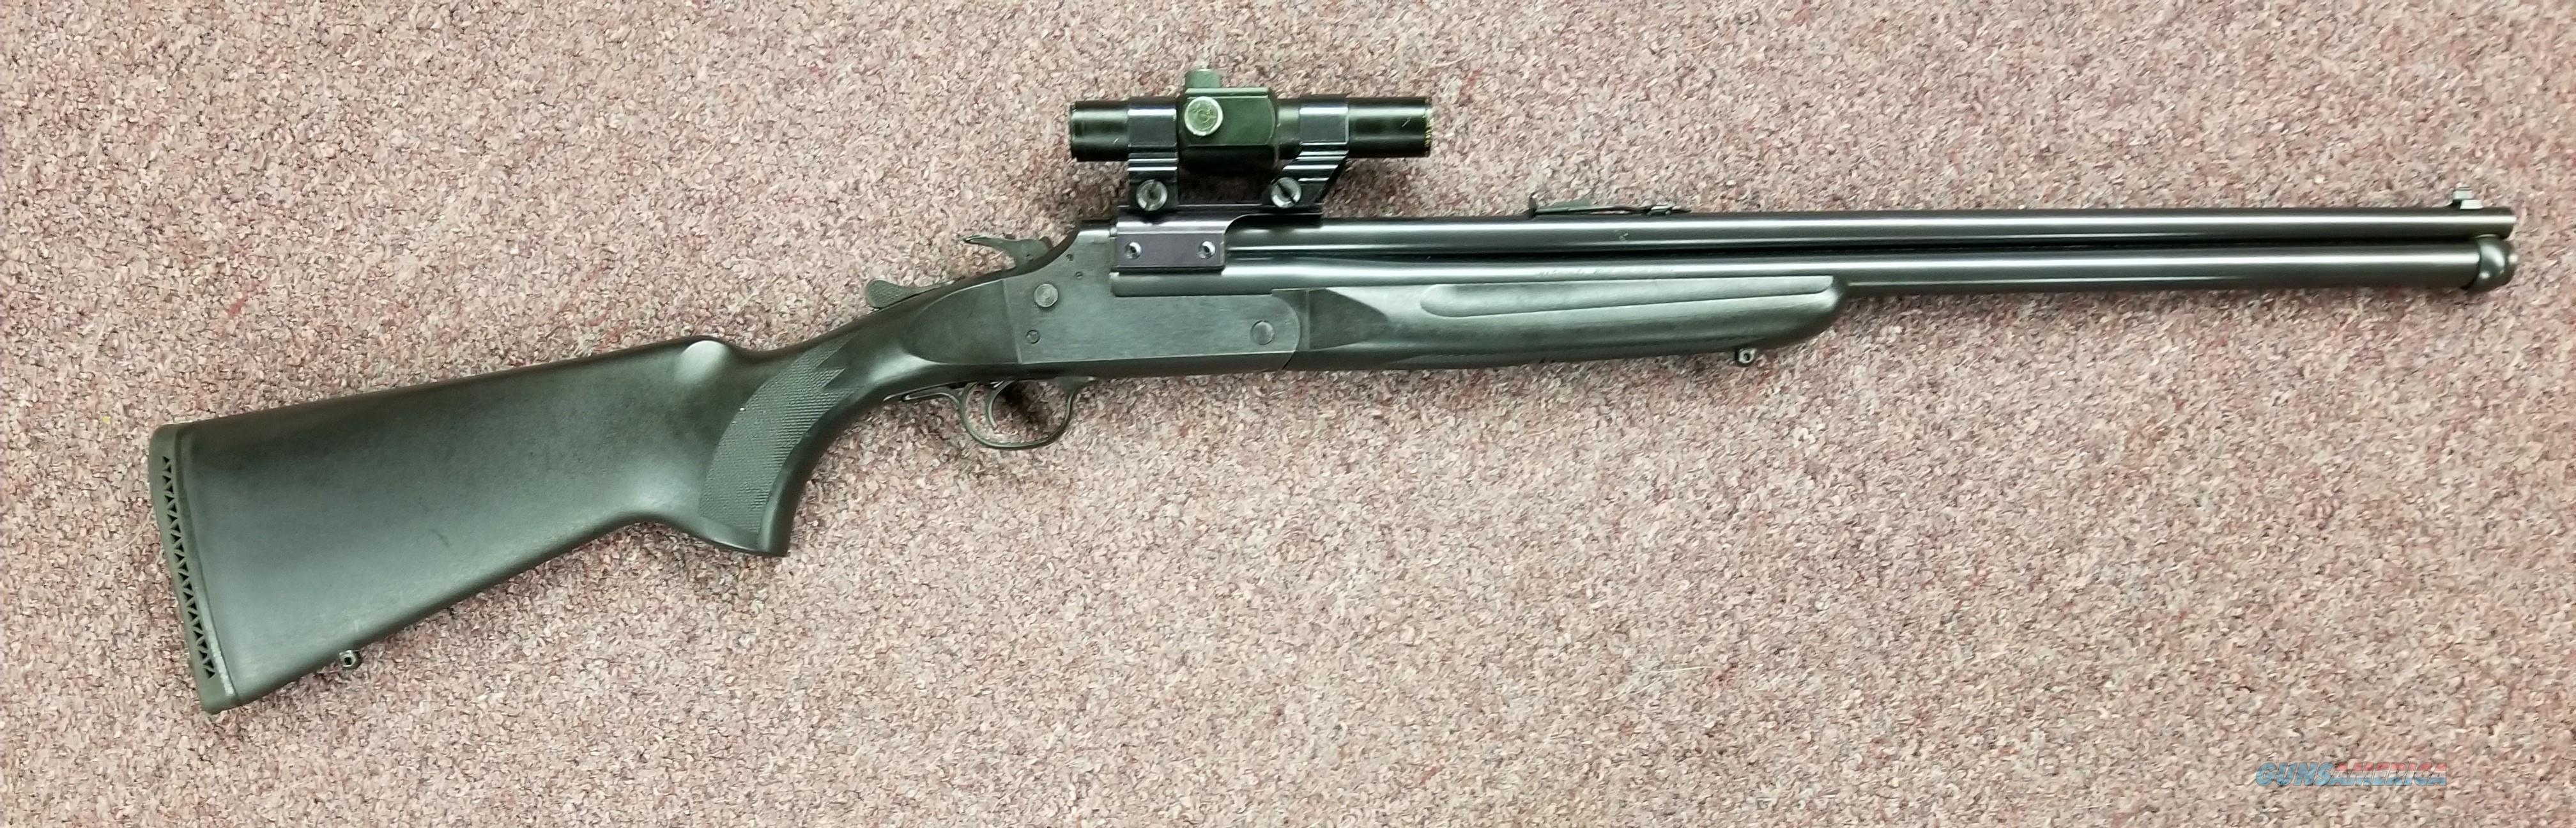 Savage 24 - 22LR/20 Gauge Combo - Red Dot - Black Synthetic - Free Shipping !  Guns > Rifles > Savage Rifles > Other